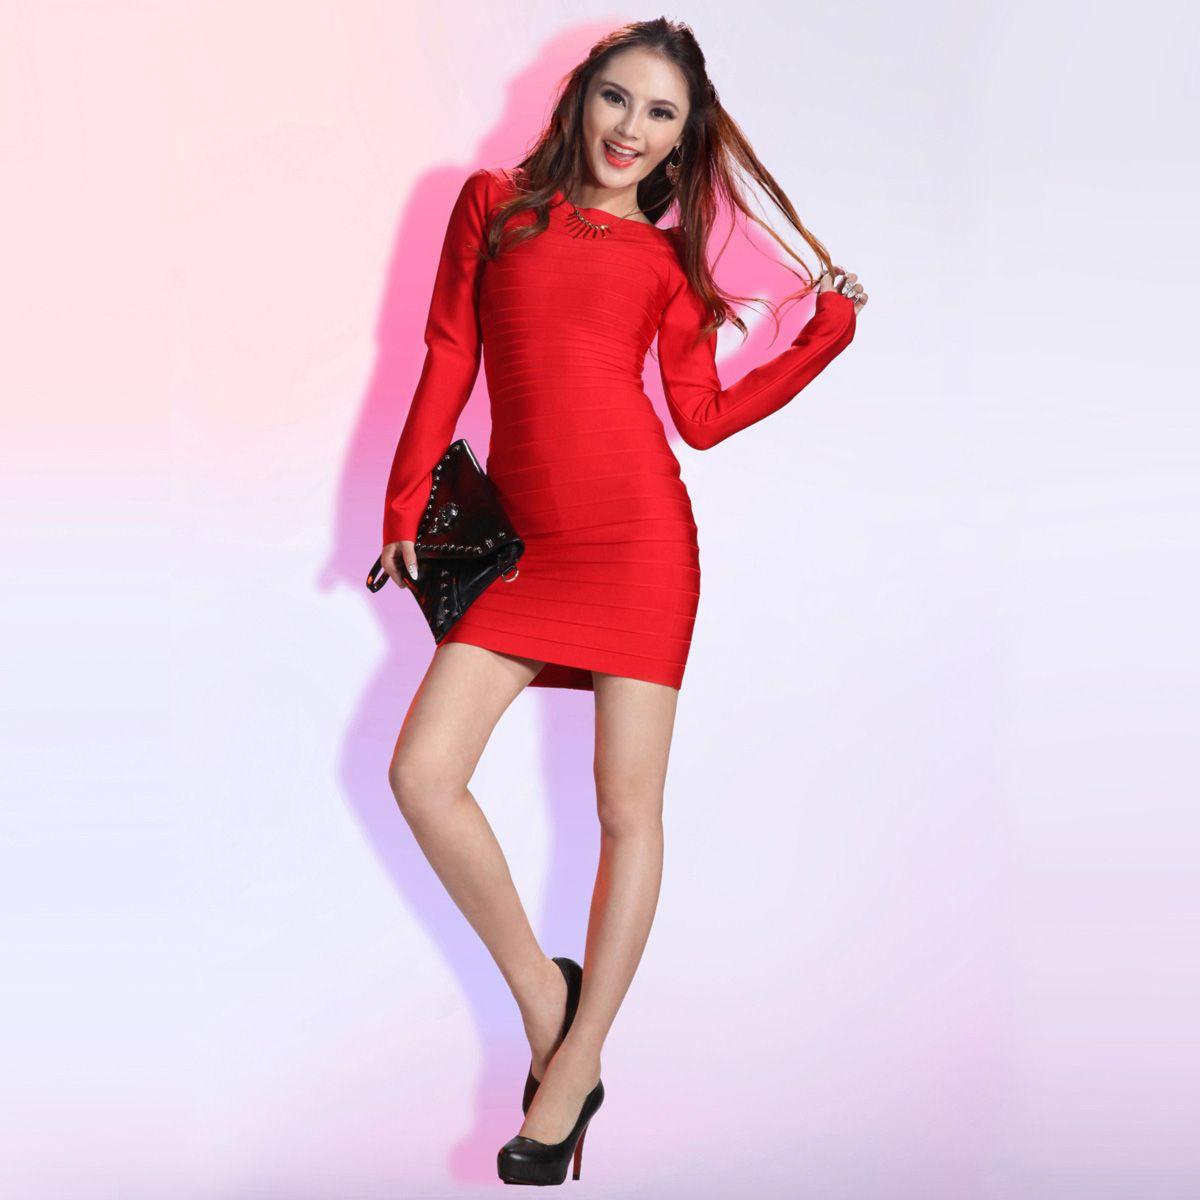 Buy cheap herve leger dresses online cheap price good qualiy